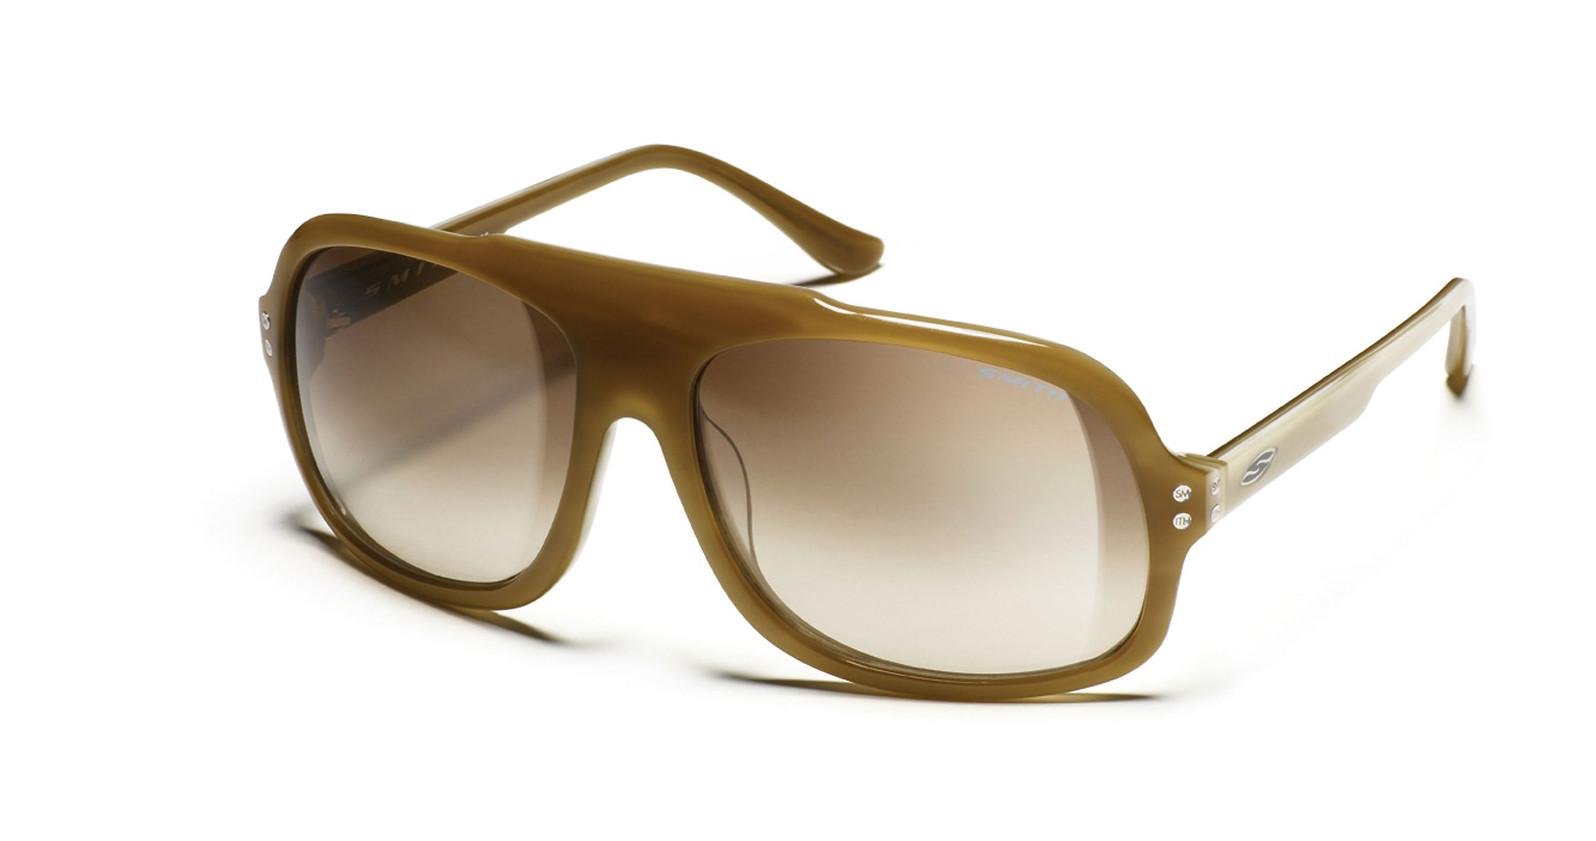 Smith Nolte Sunglasses Brown Pearl/Brown Gradient Lens  smith-nolte-sngls-brwnpearlbrwn-09.jpg